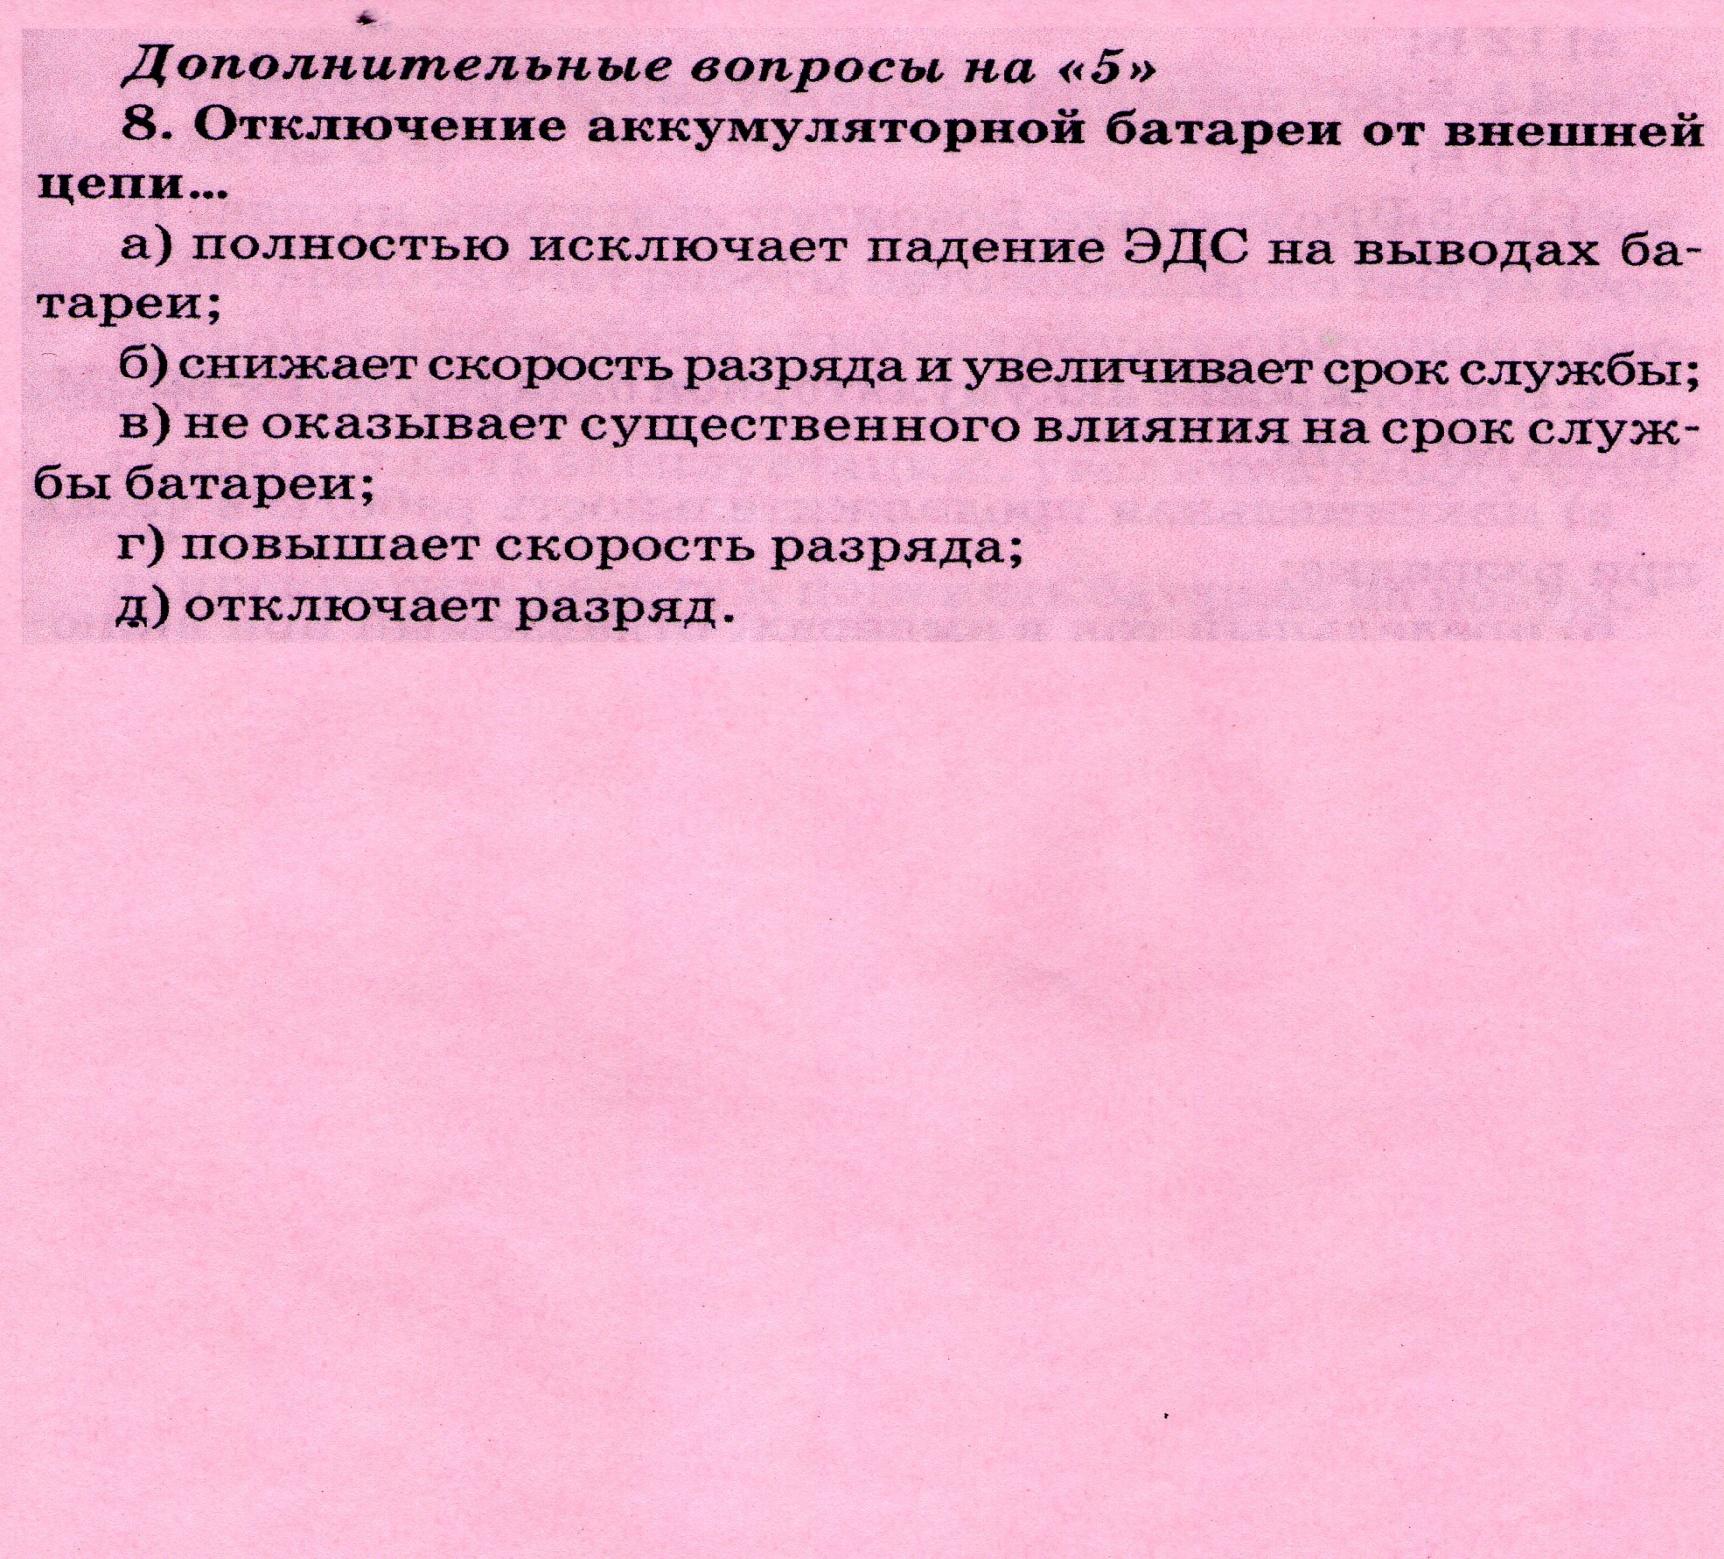 C:\Users\Василий Мельченко\Pictures\img545.jpg